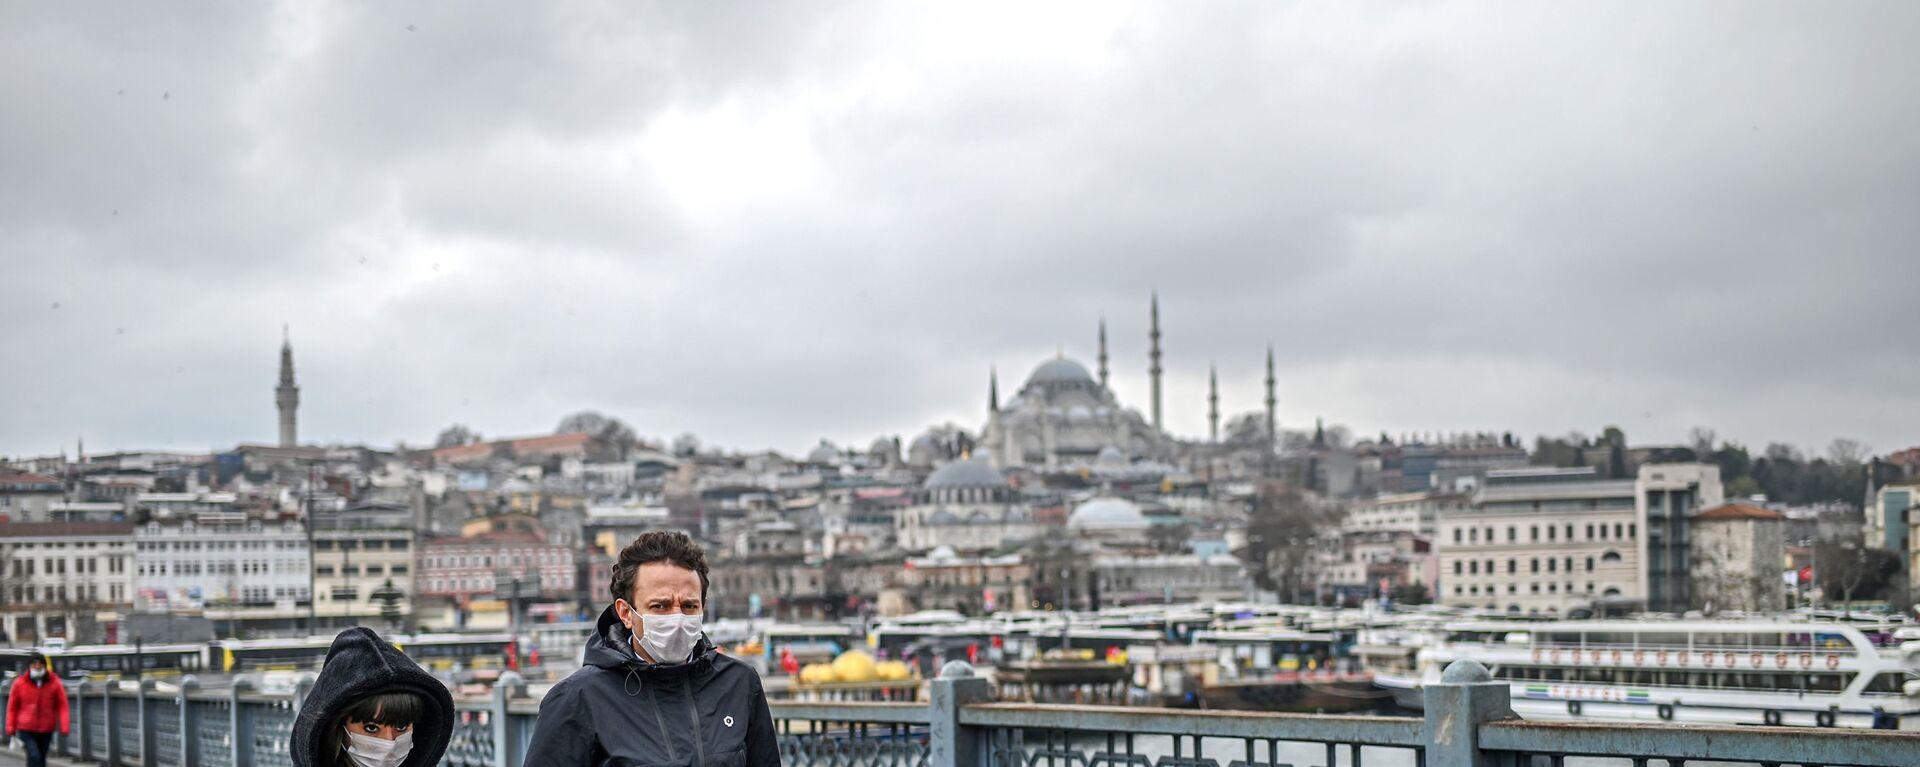 Пара в масках на улице Стамбула, Турция - Sputnik Узбекистан, 1920, 17.04.2020